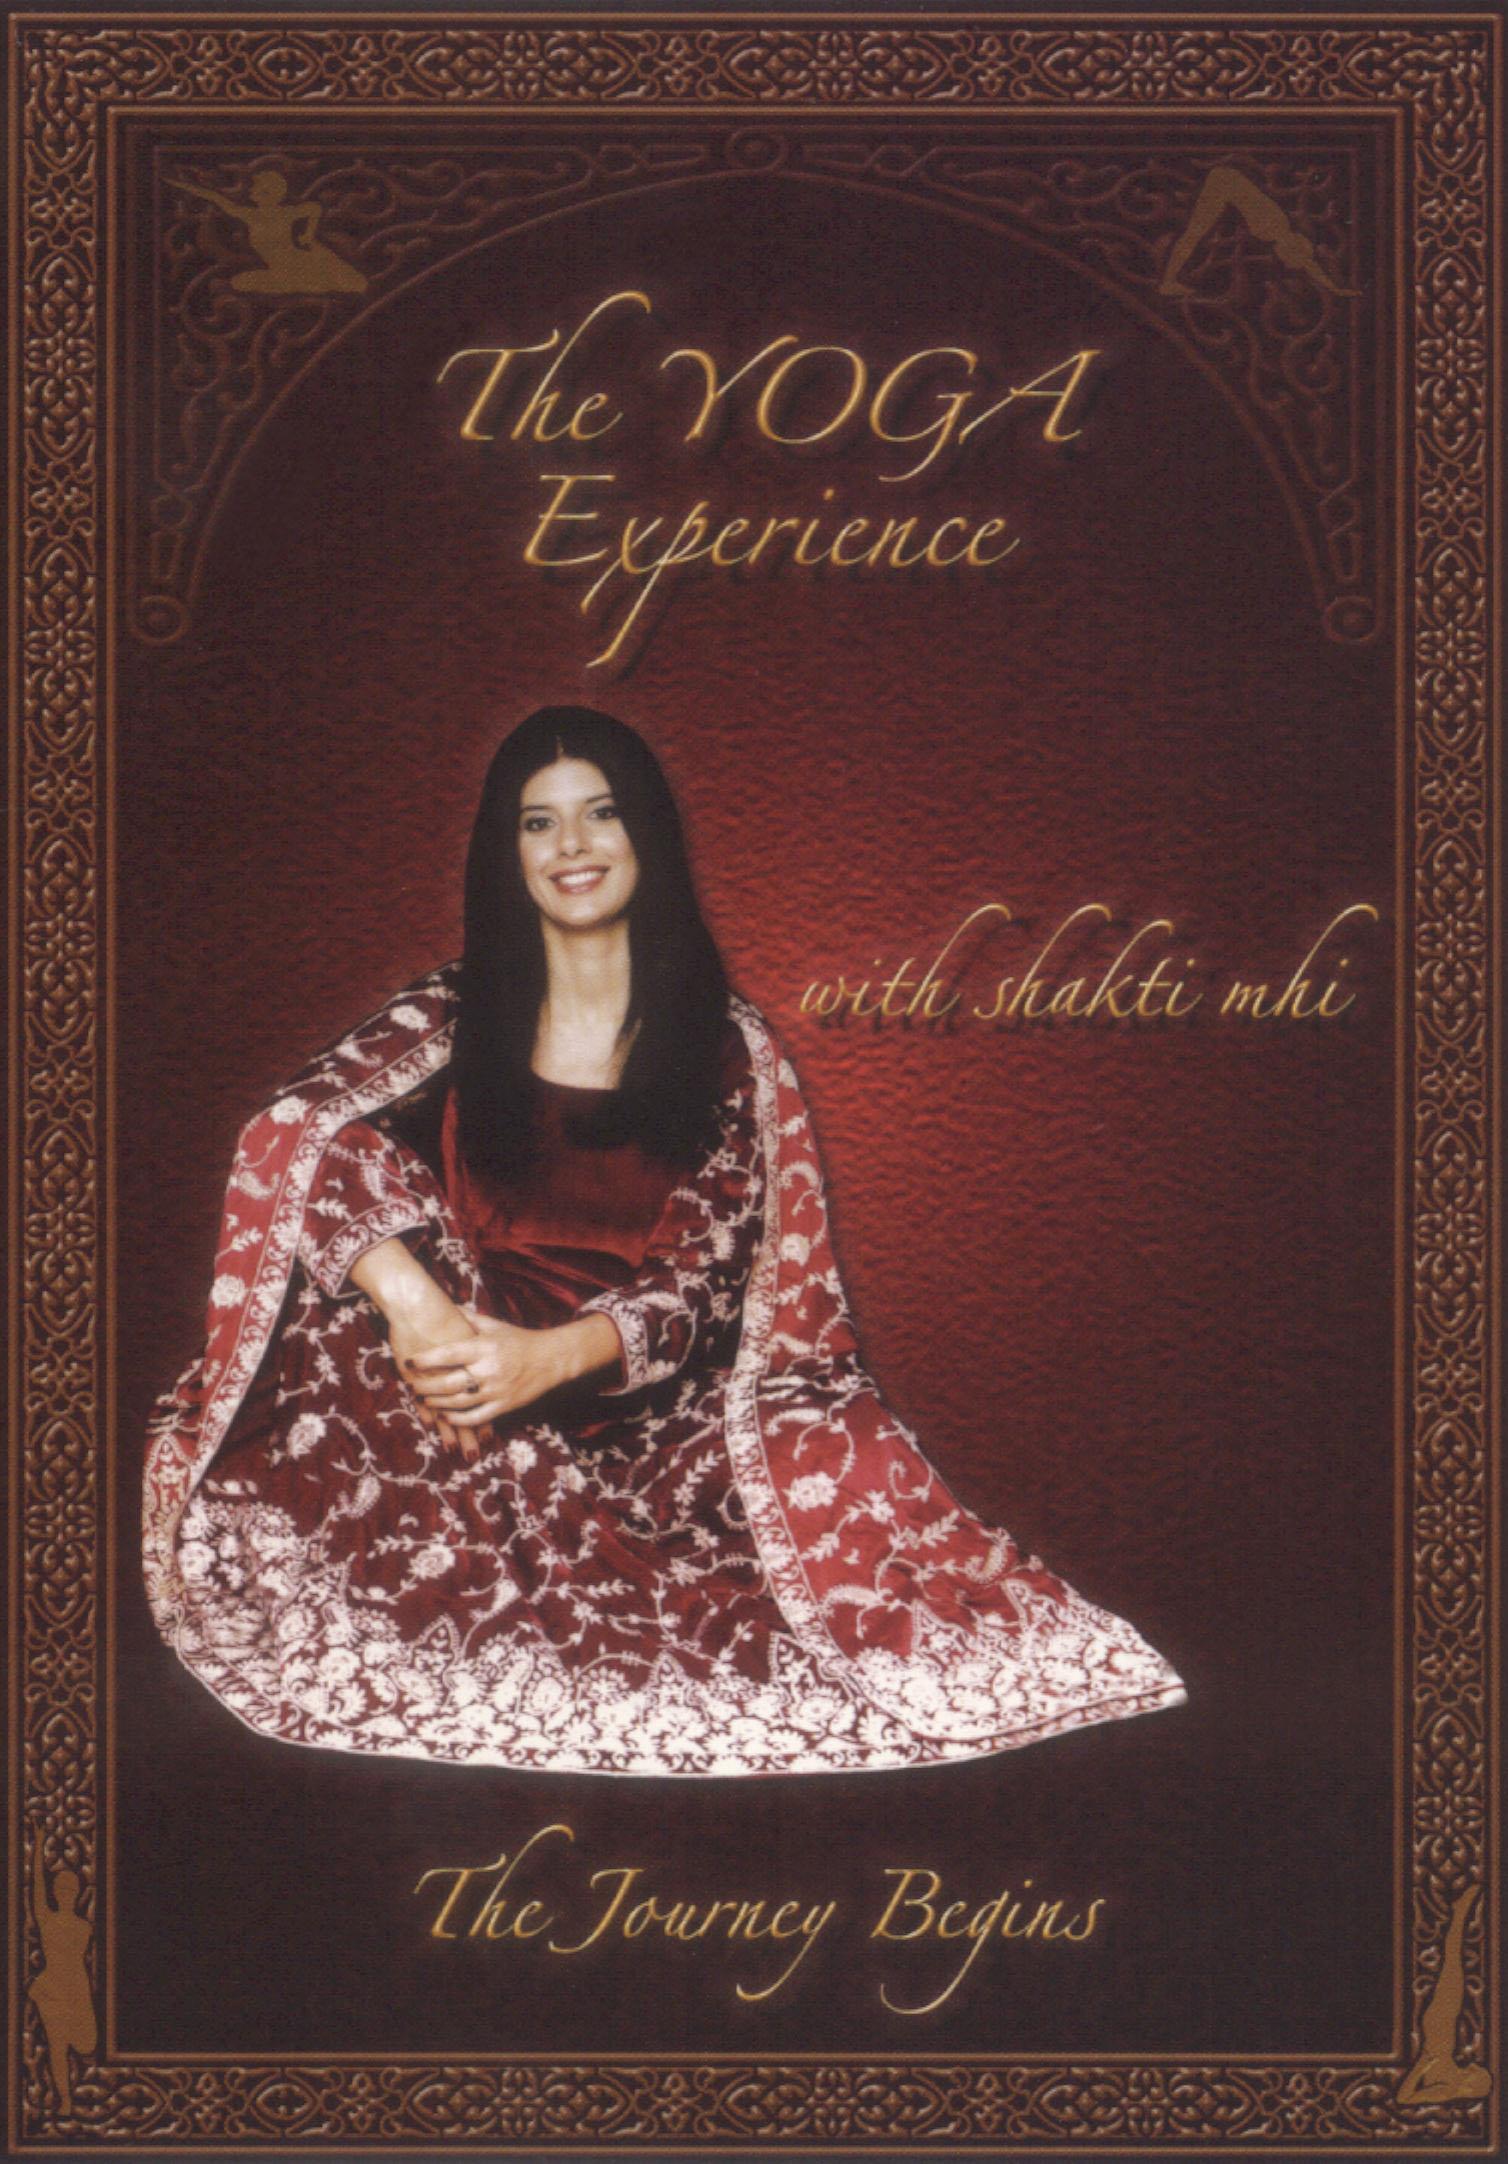 Shakti Mhi: The Yoga Experience with Shakti Mhi